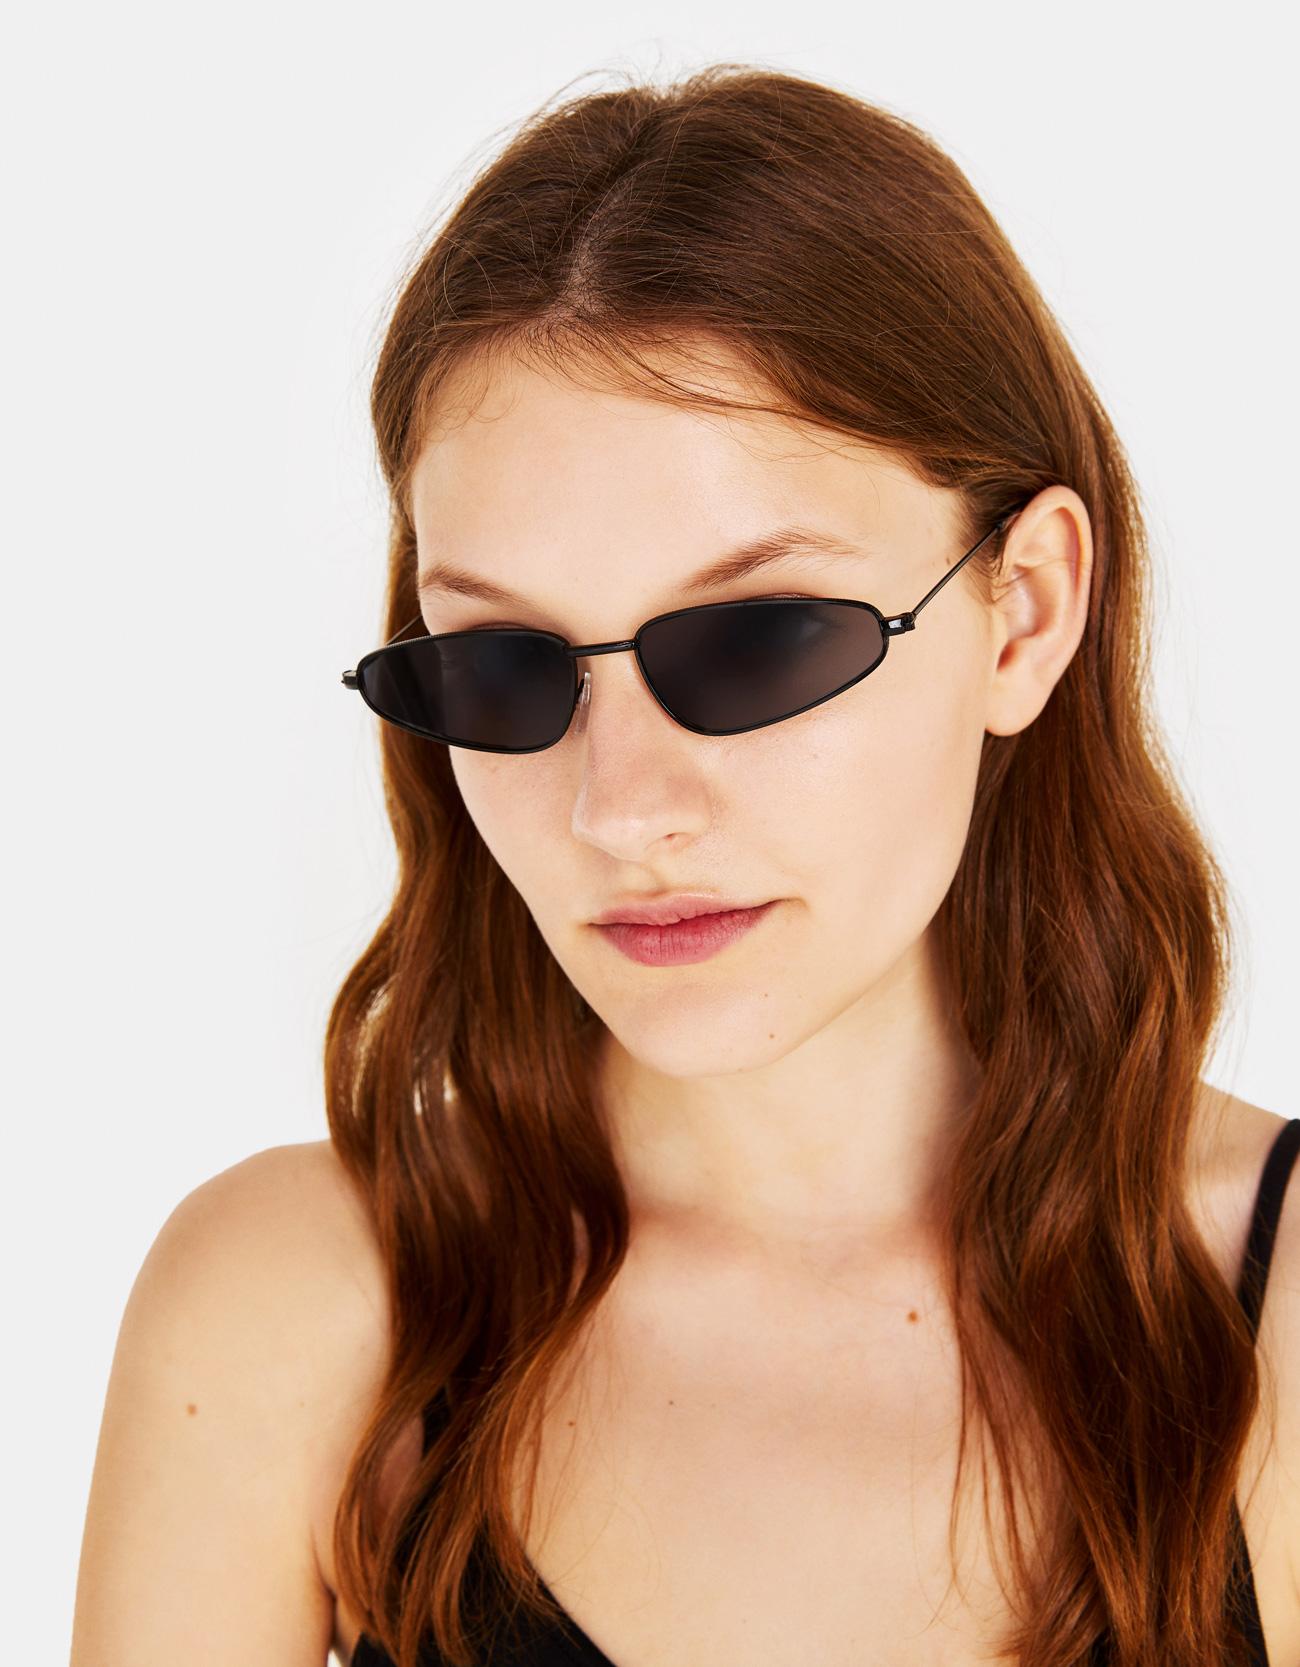 810283cc7dff Slim Cateye Sunglasses - Skinny - Bershka Albania